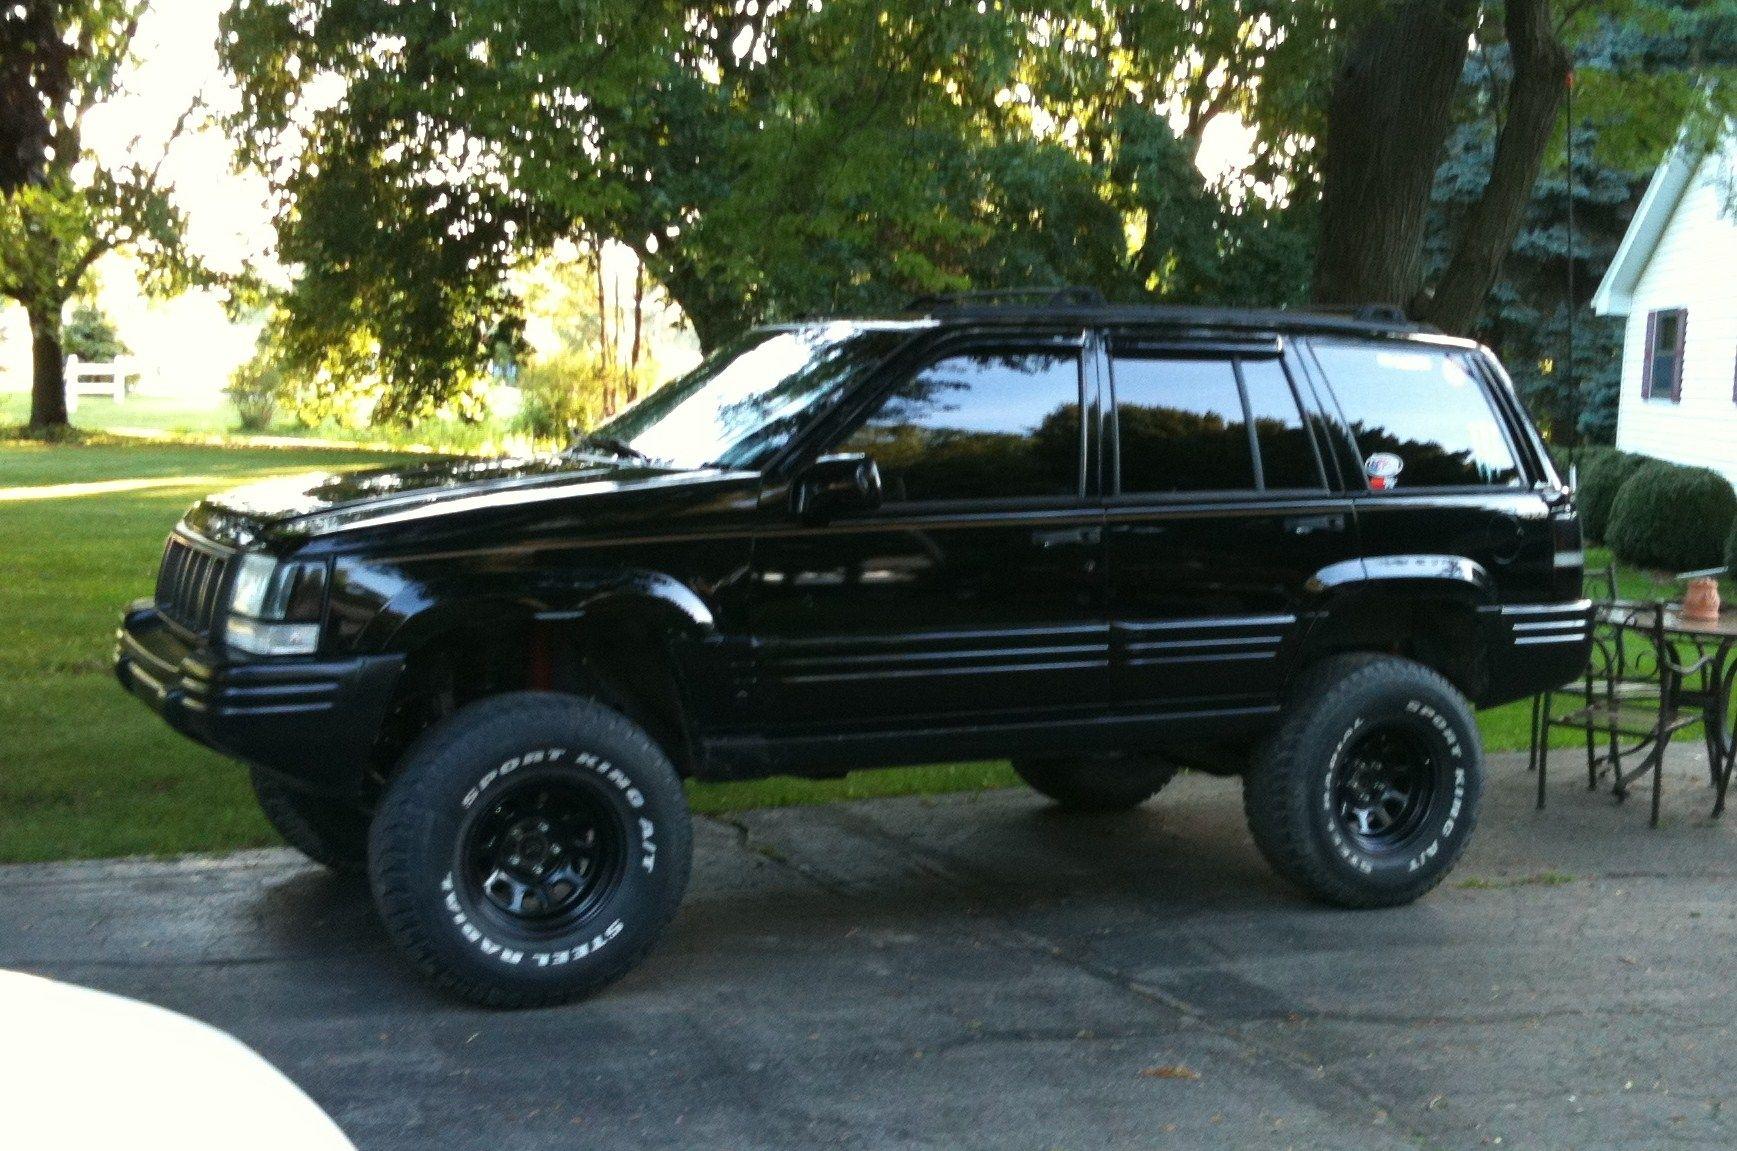 jeep cherokee limited custom black 1997 - Pesquisa Google